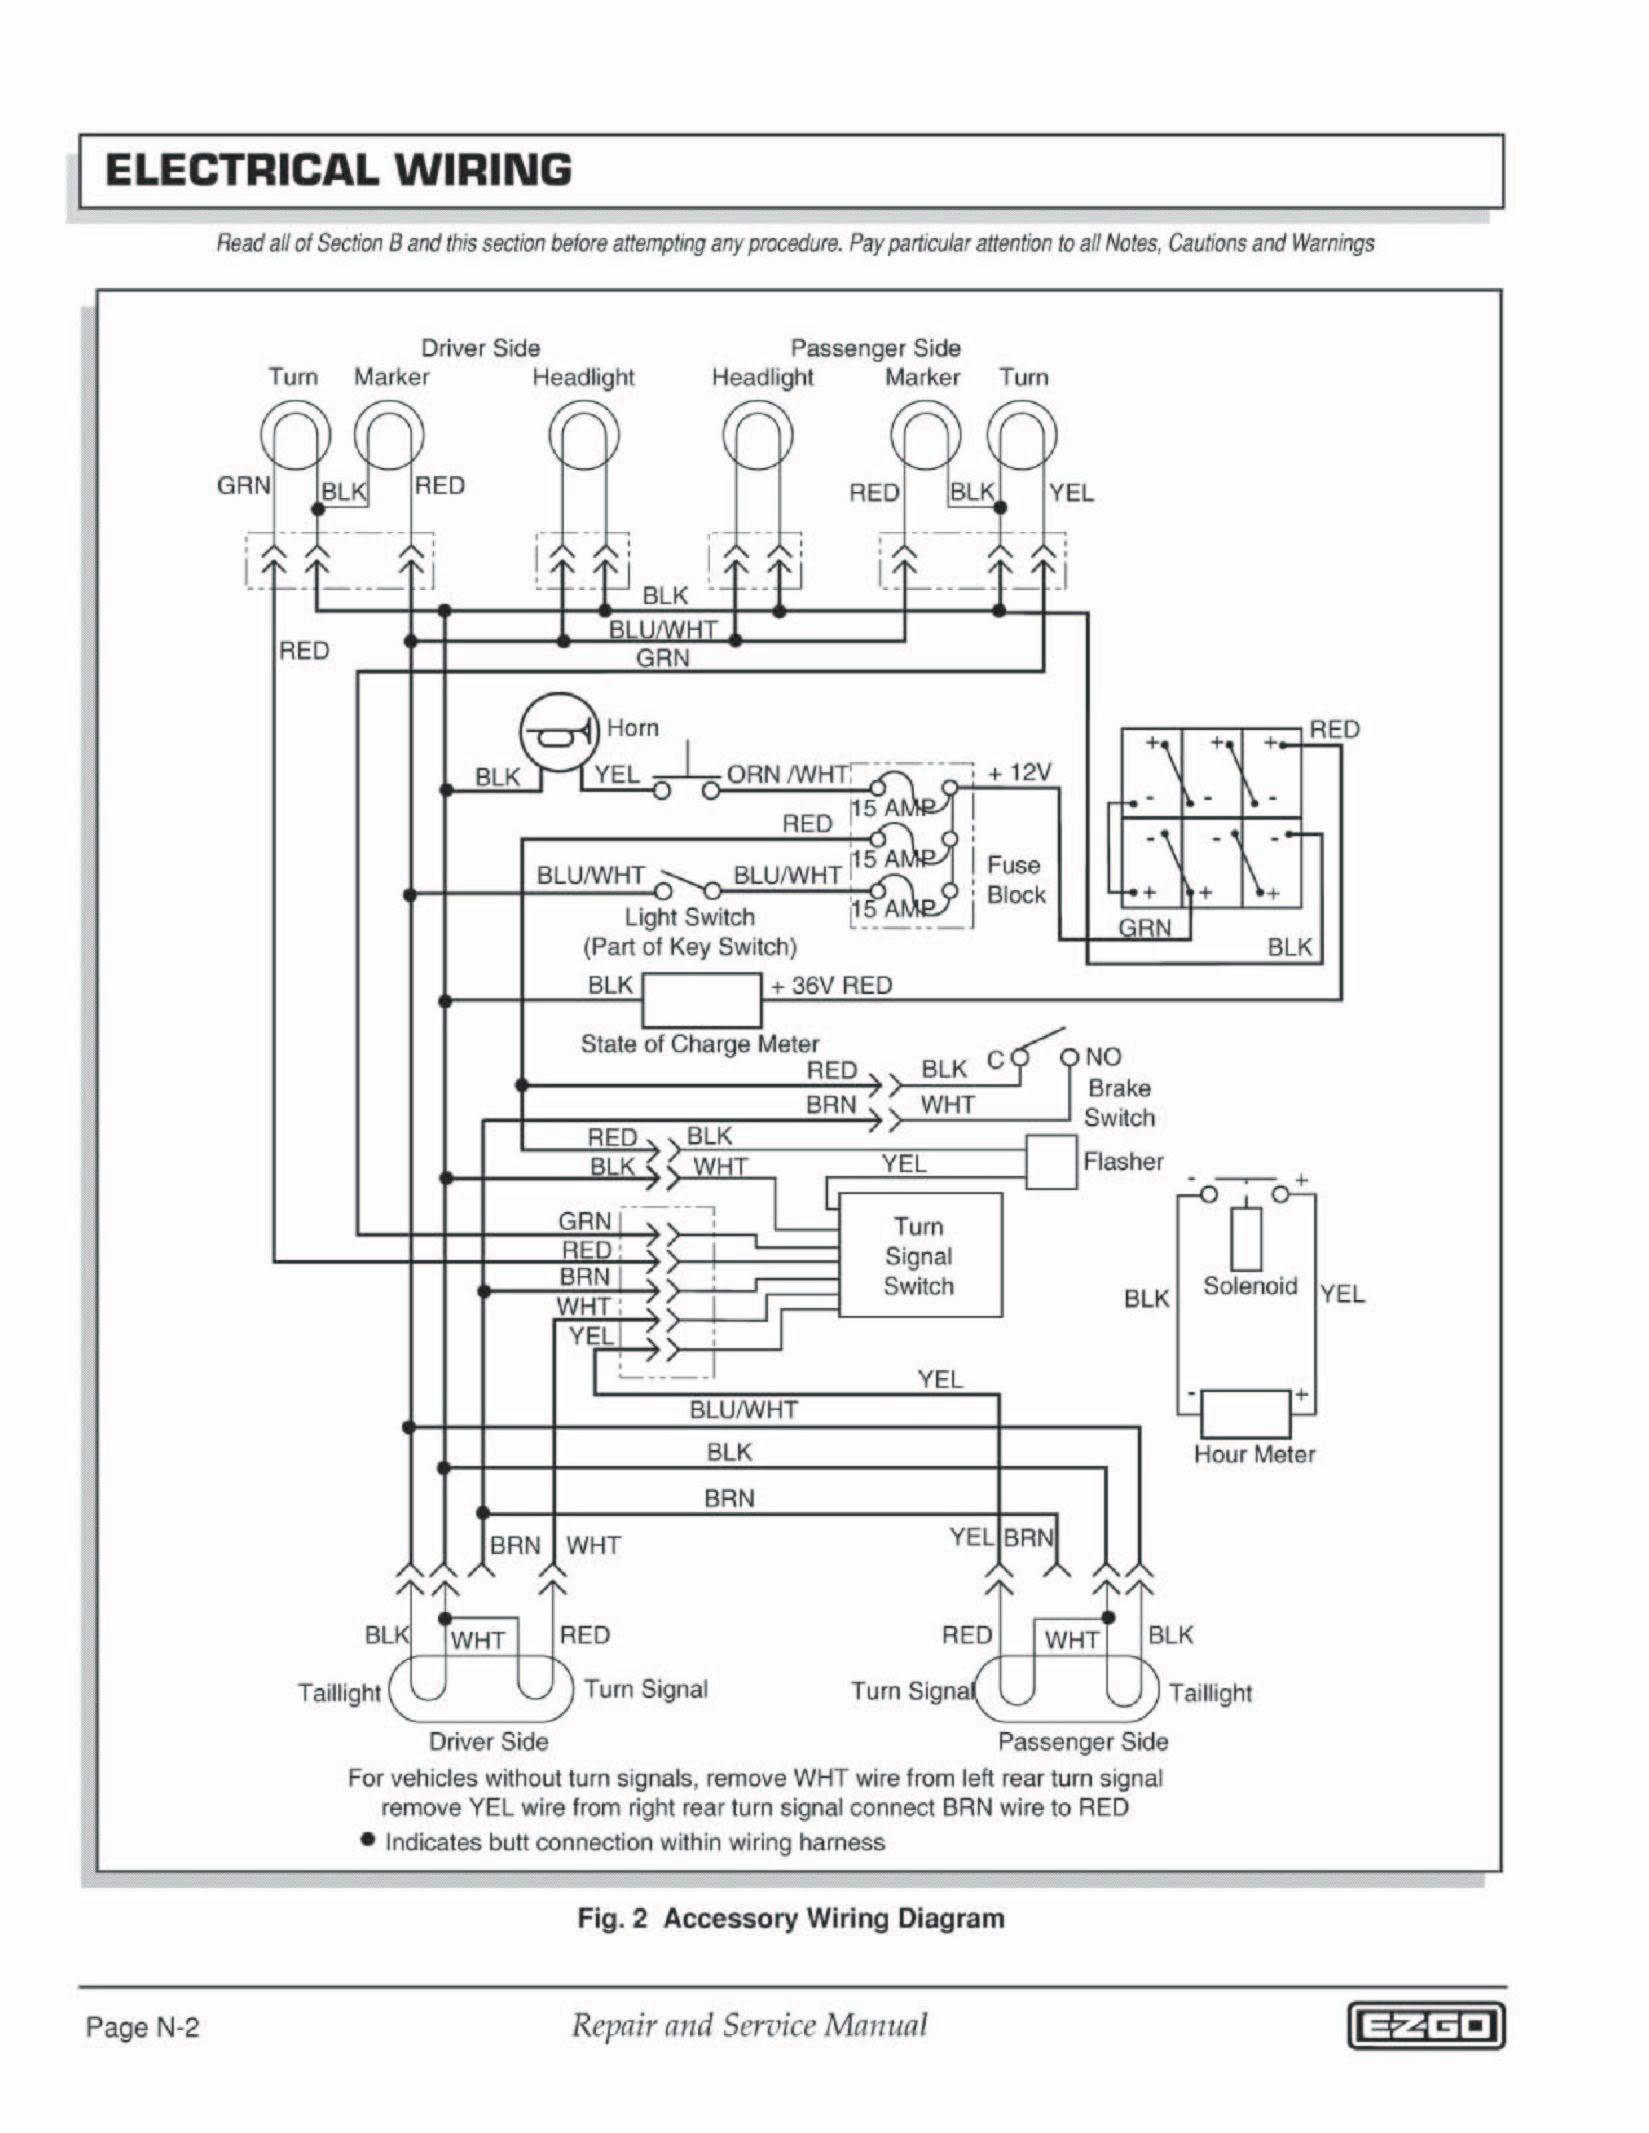 hight resolution of ezgo marathon wiring diagram wiring diagram for ezgo txt refrence ez go headlight wiring diagram